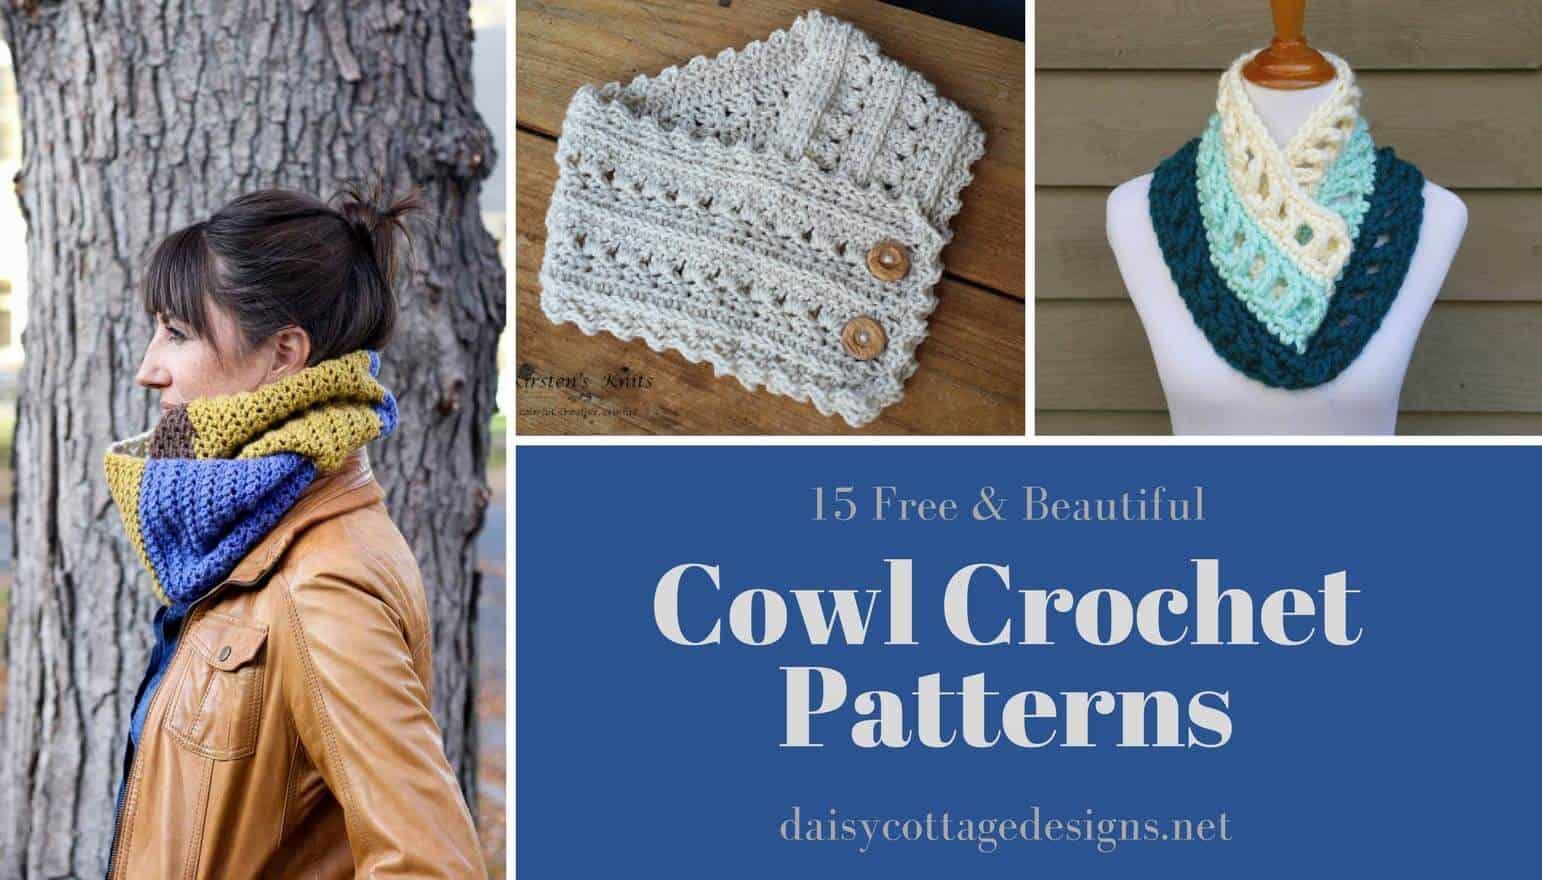 braided cowl crochet pattern